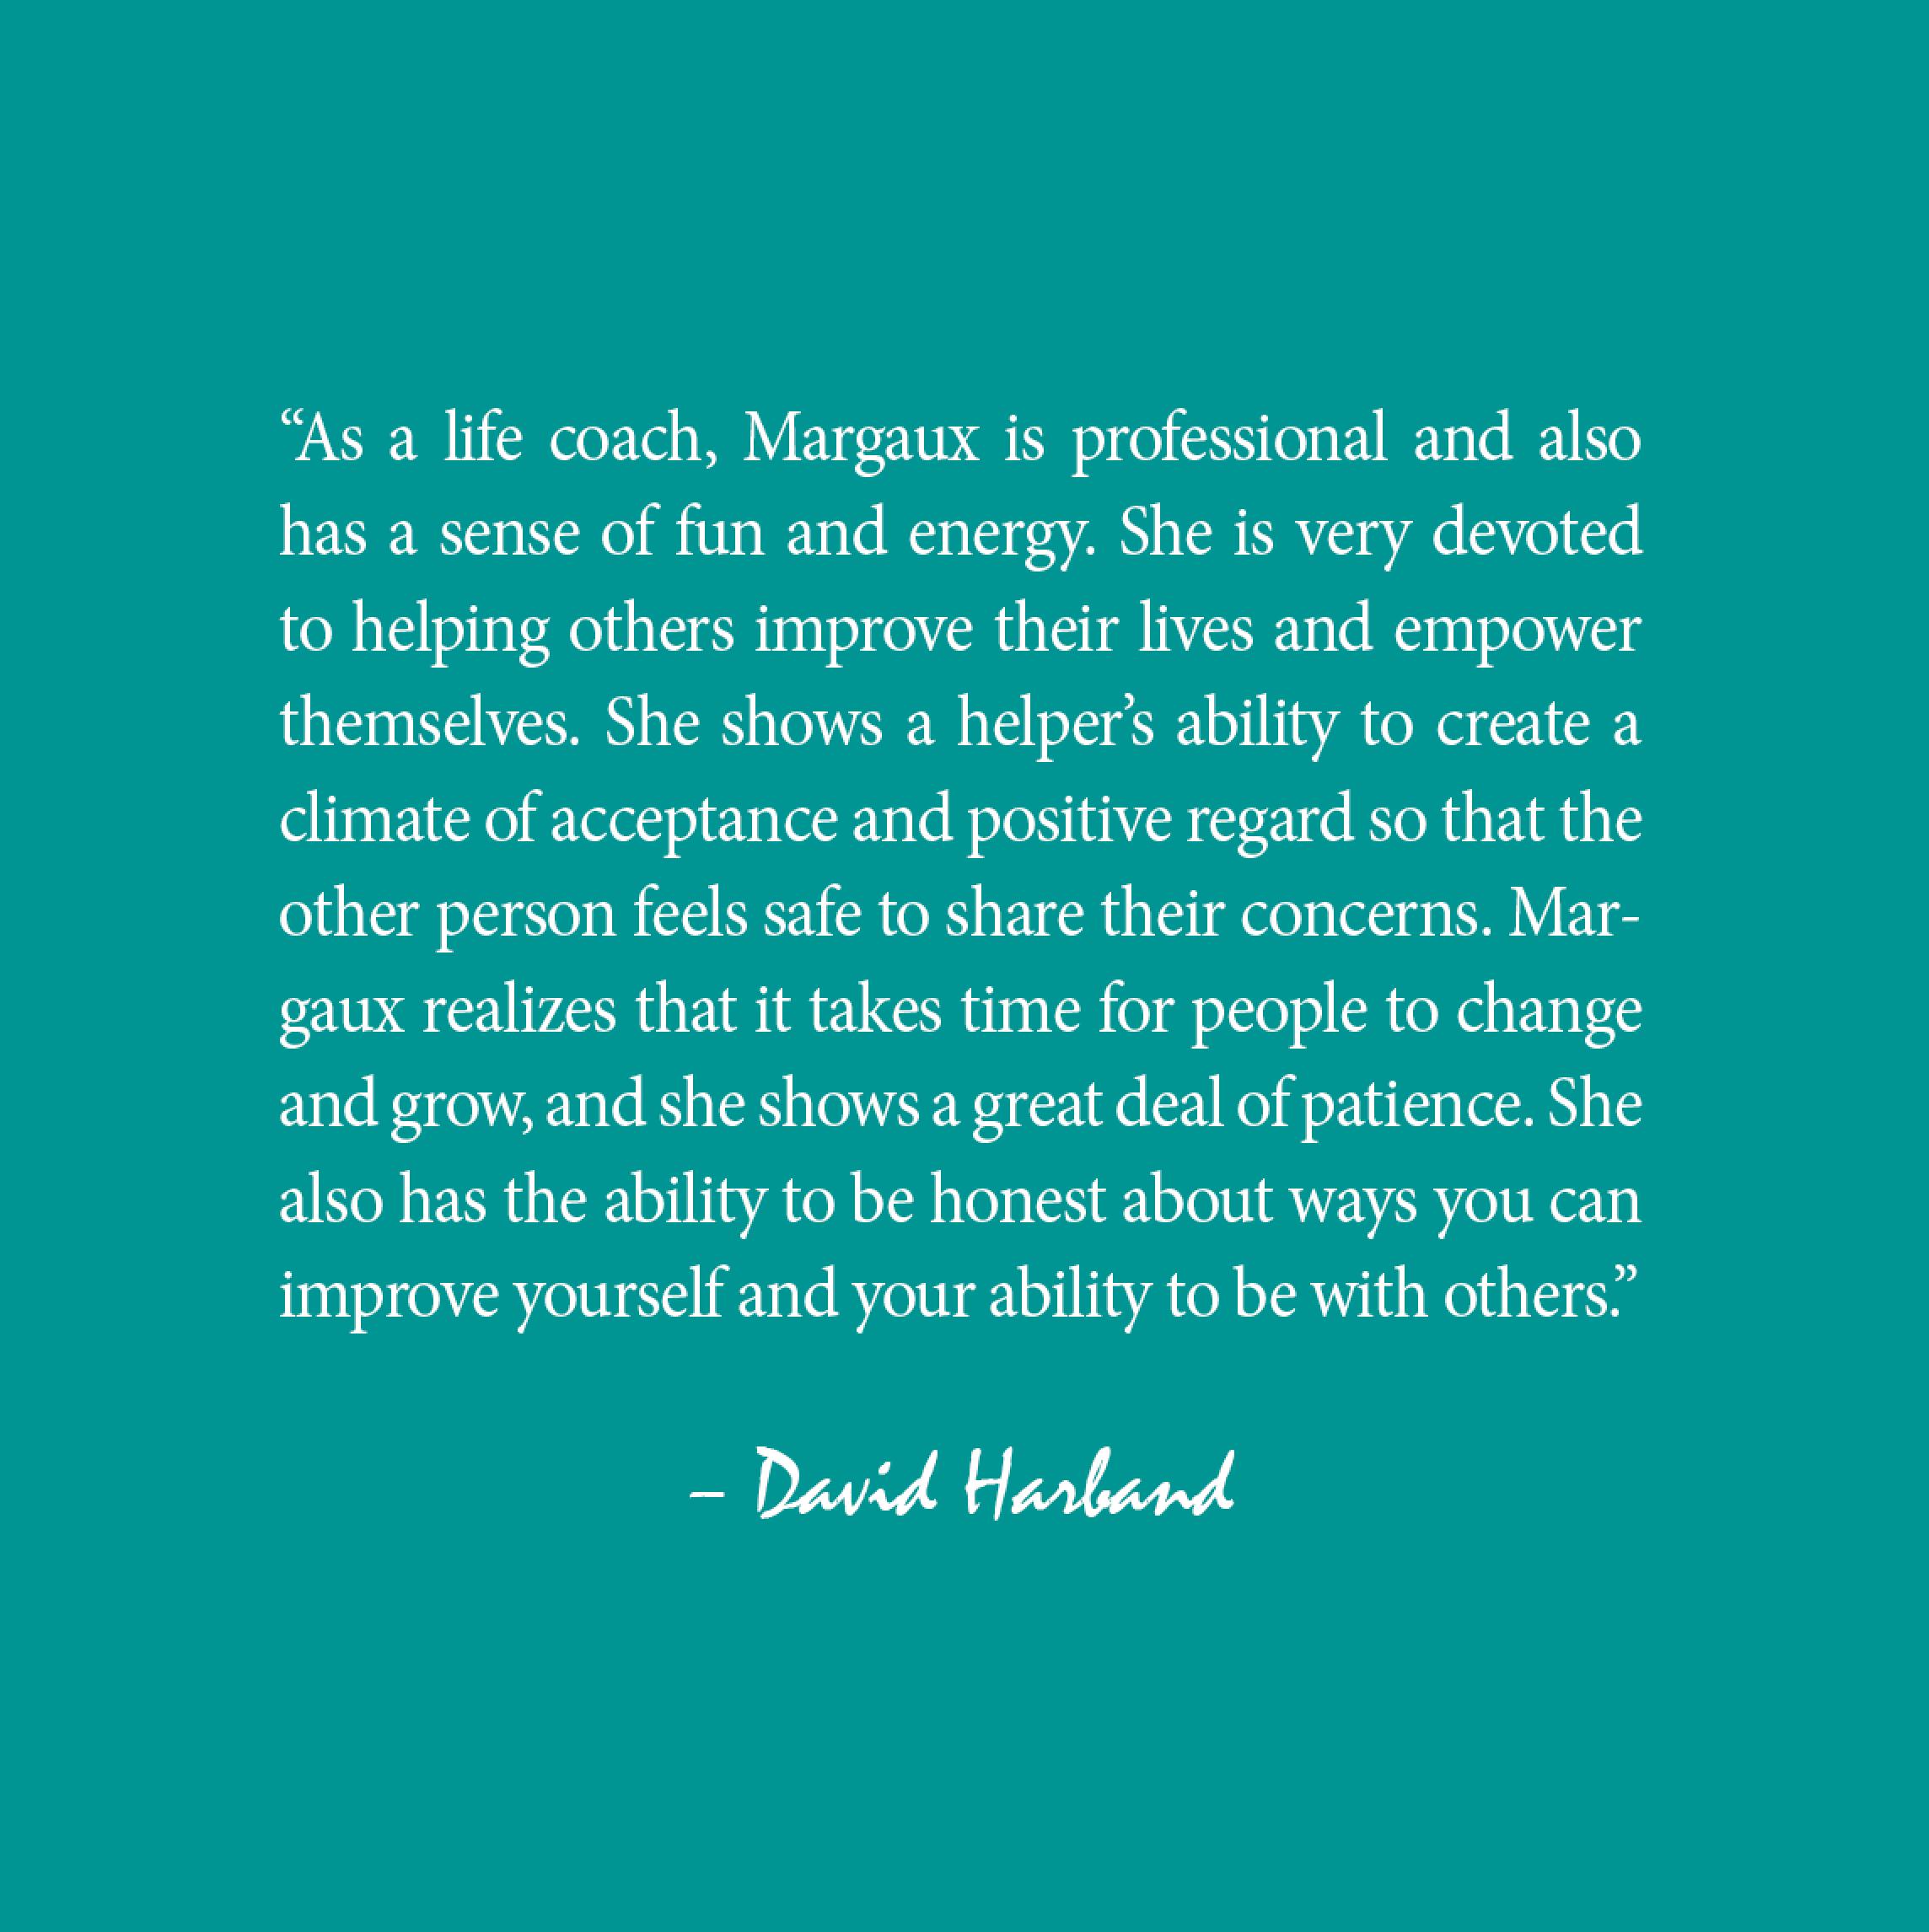 David Harband